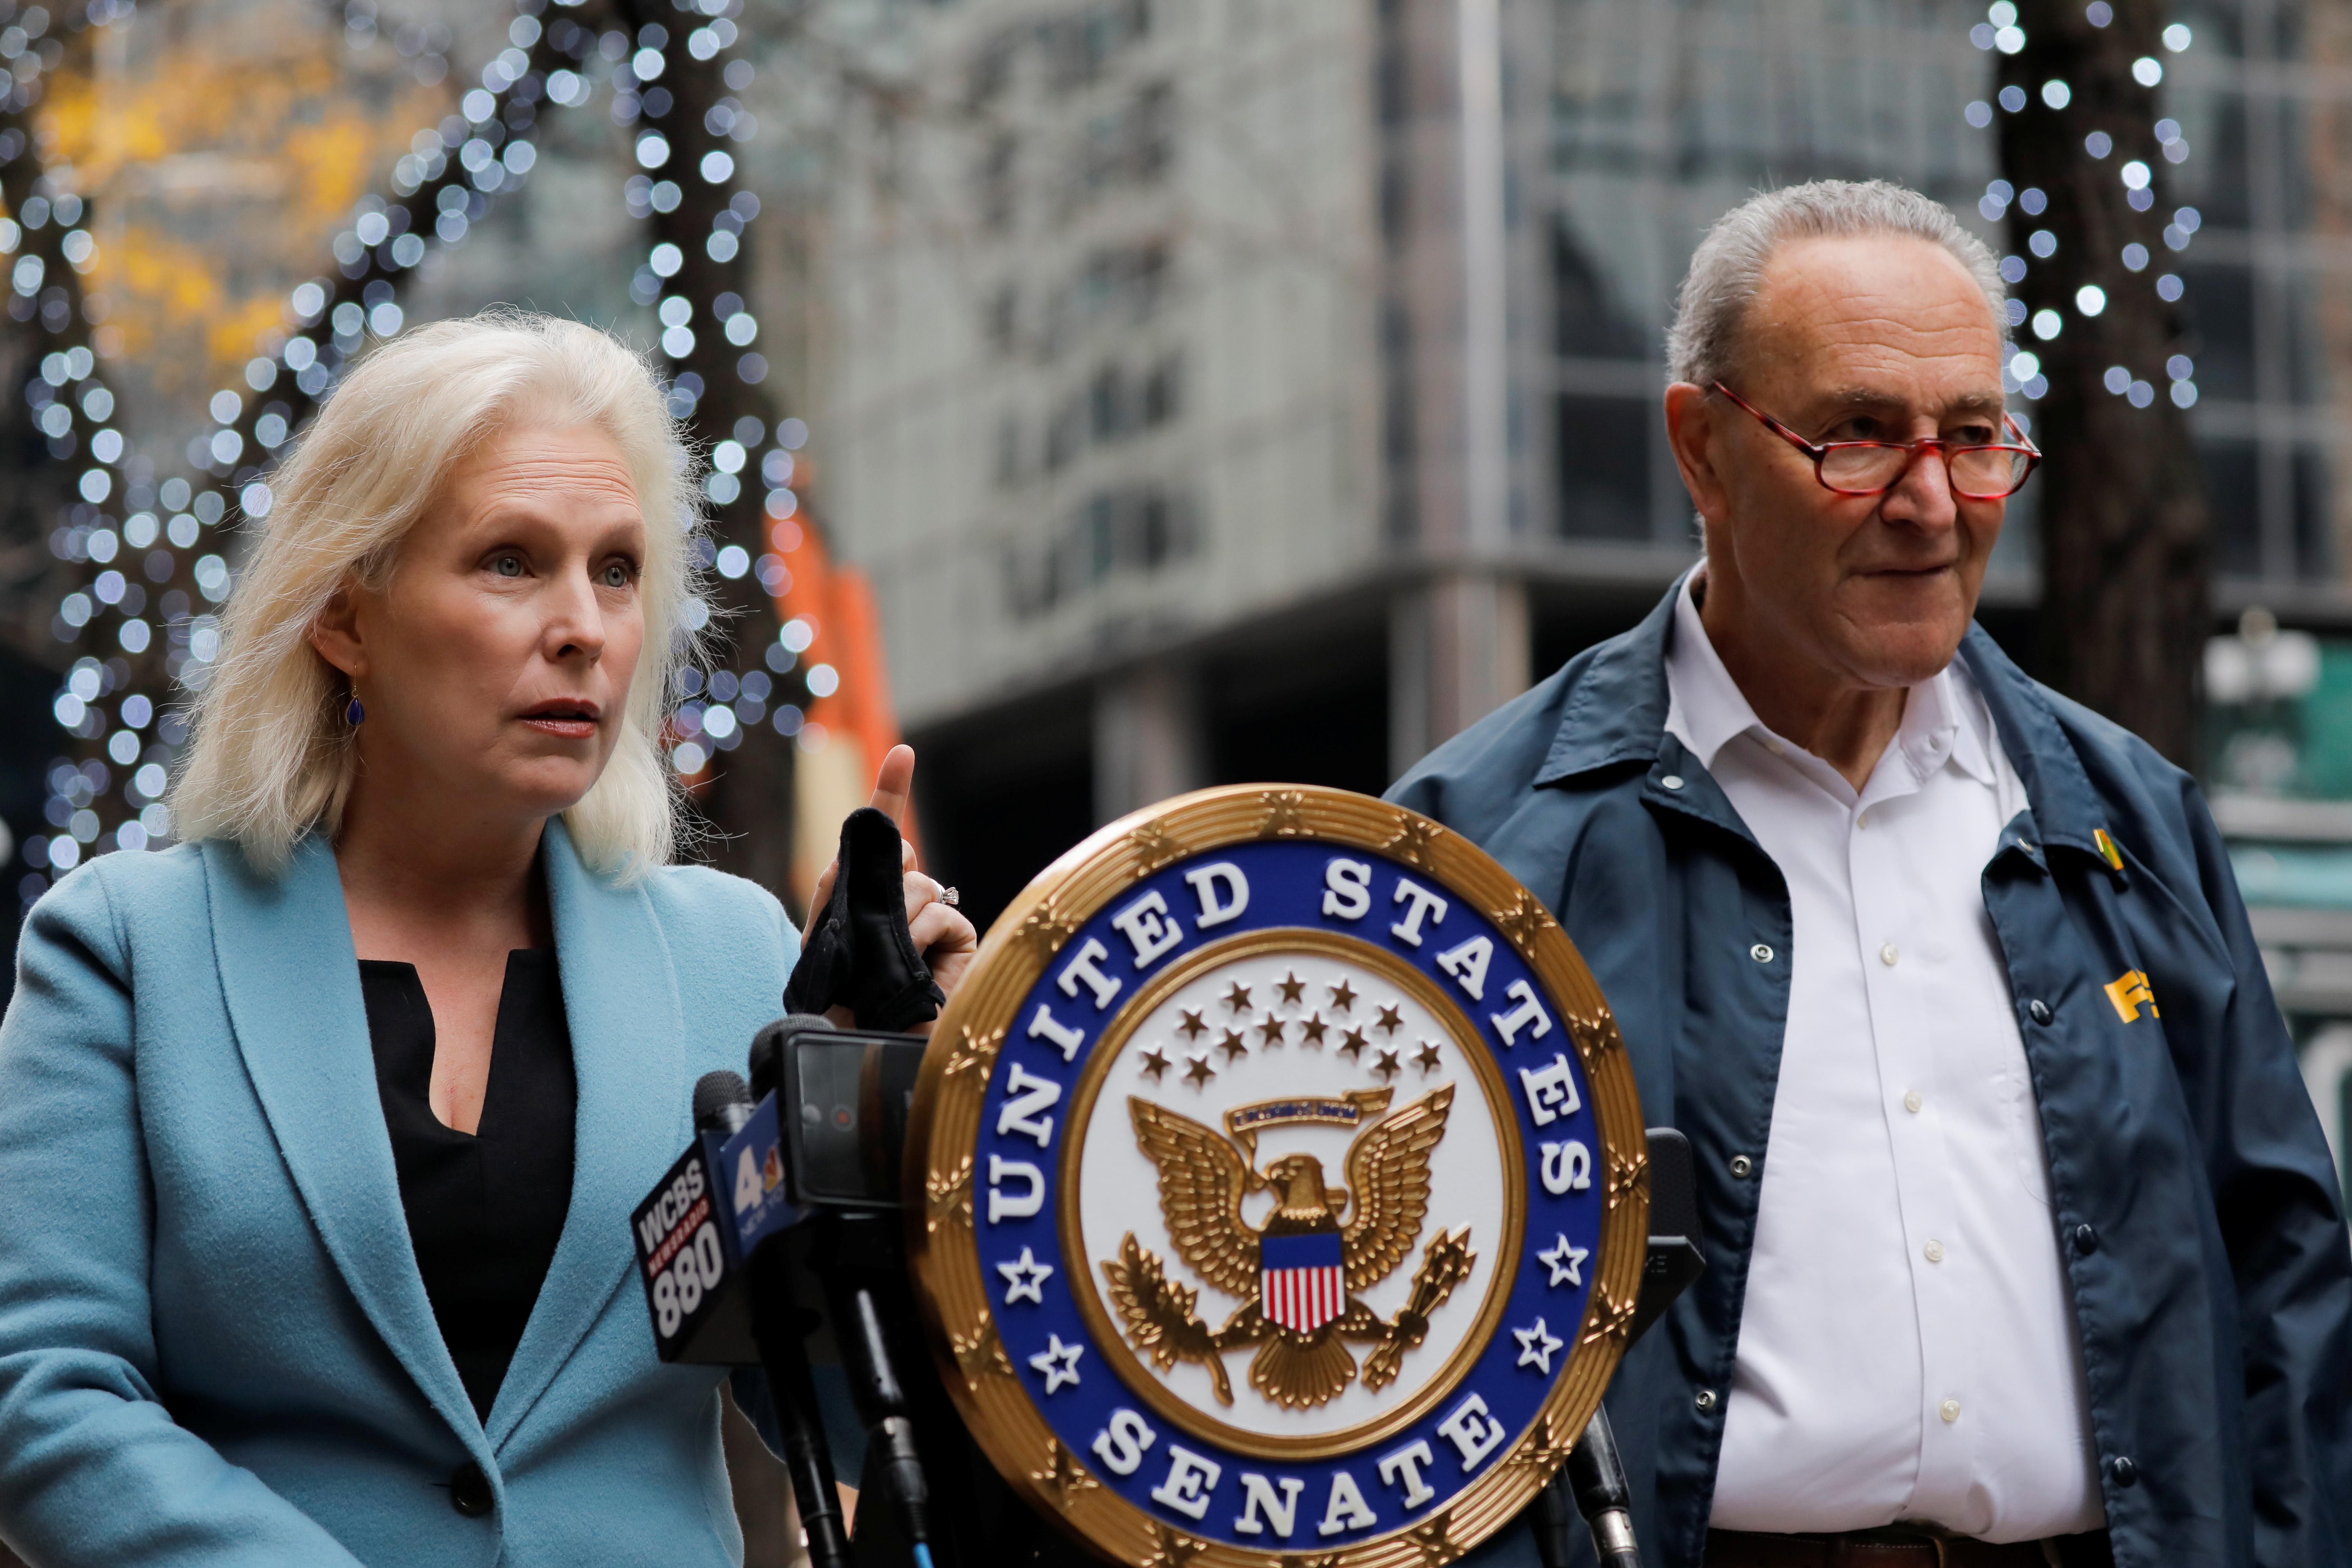 U.S. Senator Chuck Schumer and U.S Senator Kirsten Gillibrand deliver remarks on the coronavirus disease (COVID-19) in Manhattan, New York City, U.S., November 15, 2020.  REUTERS/Andrew Kelly